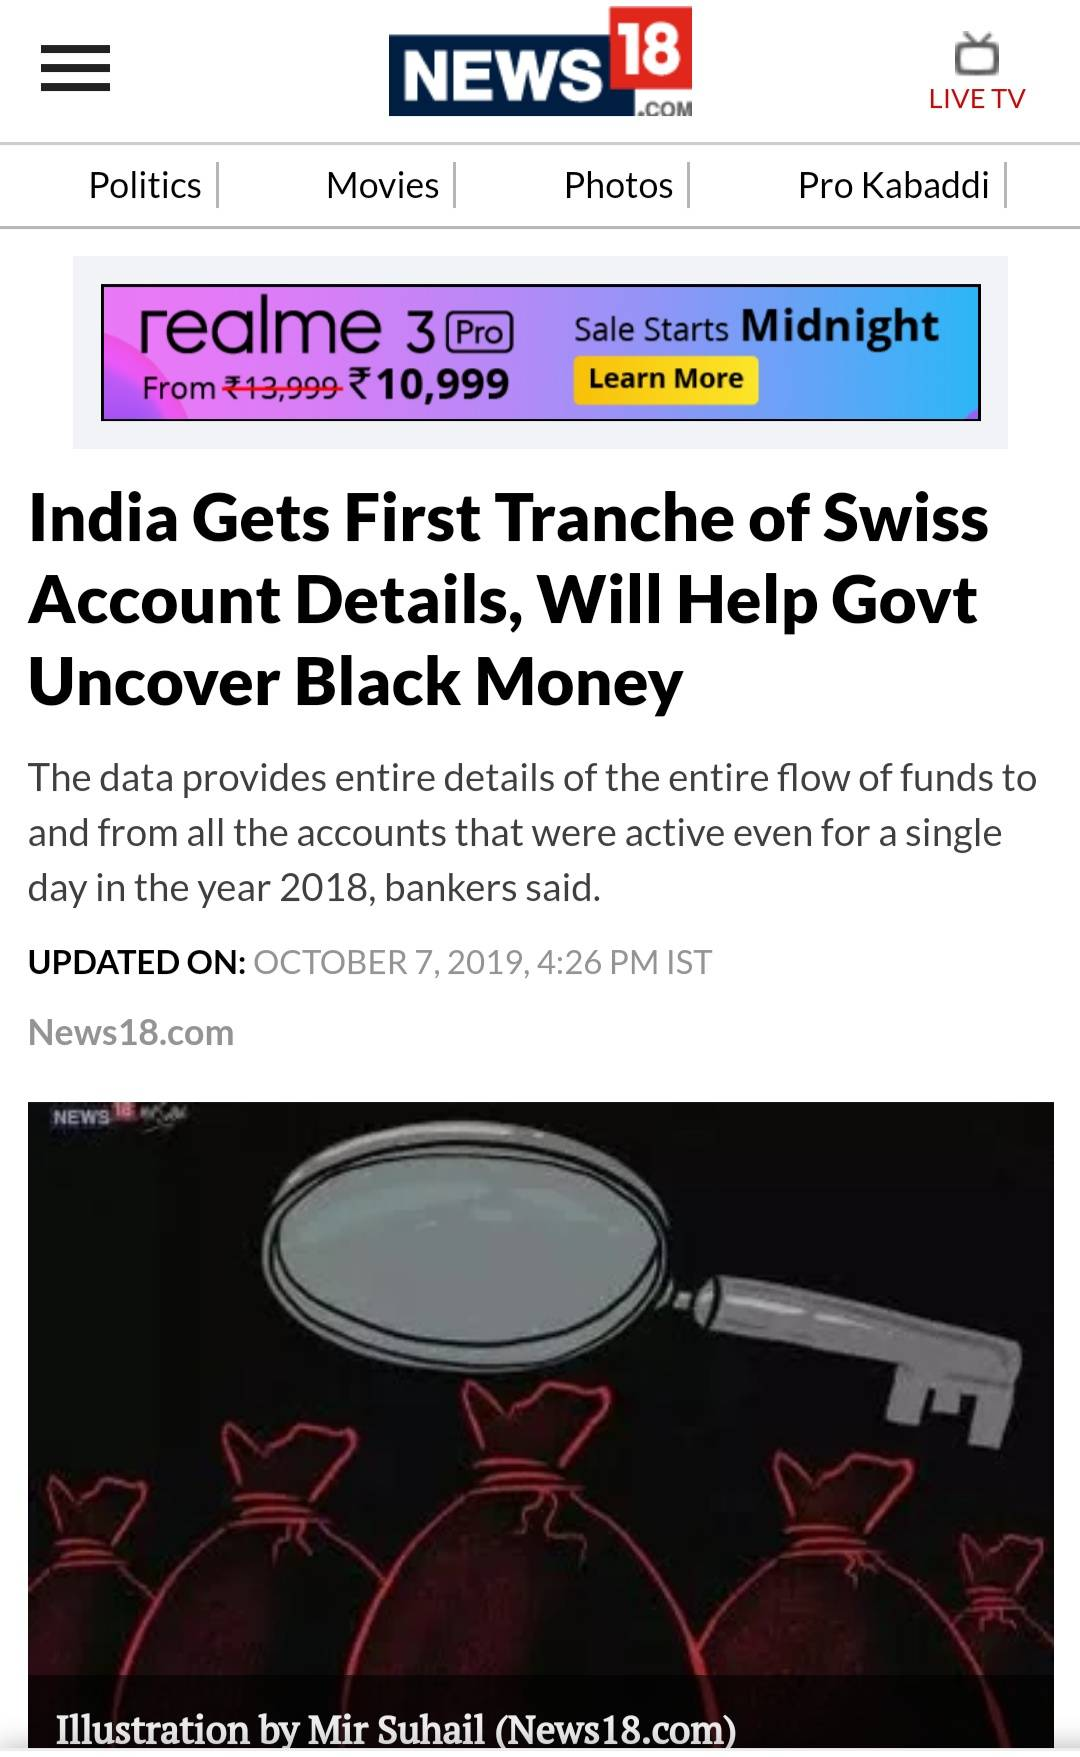 NarendraModi, BJP, FightAgainstCorruption